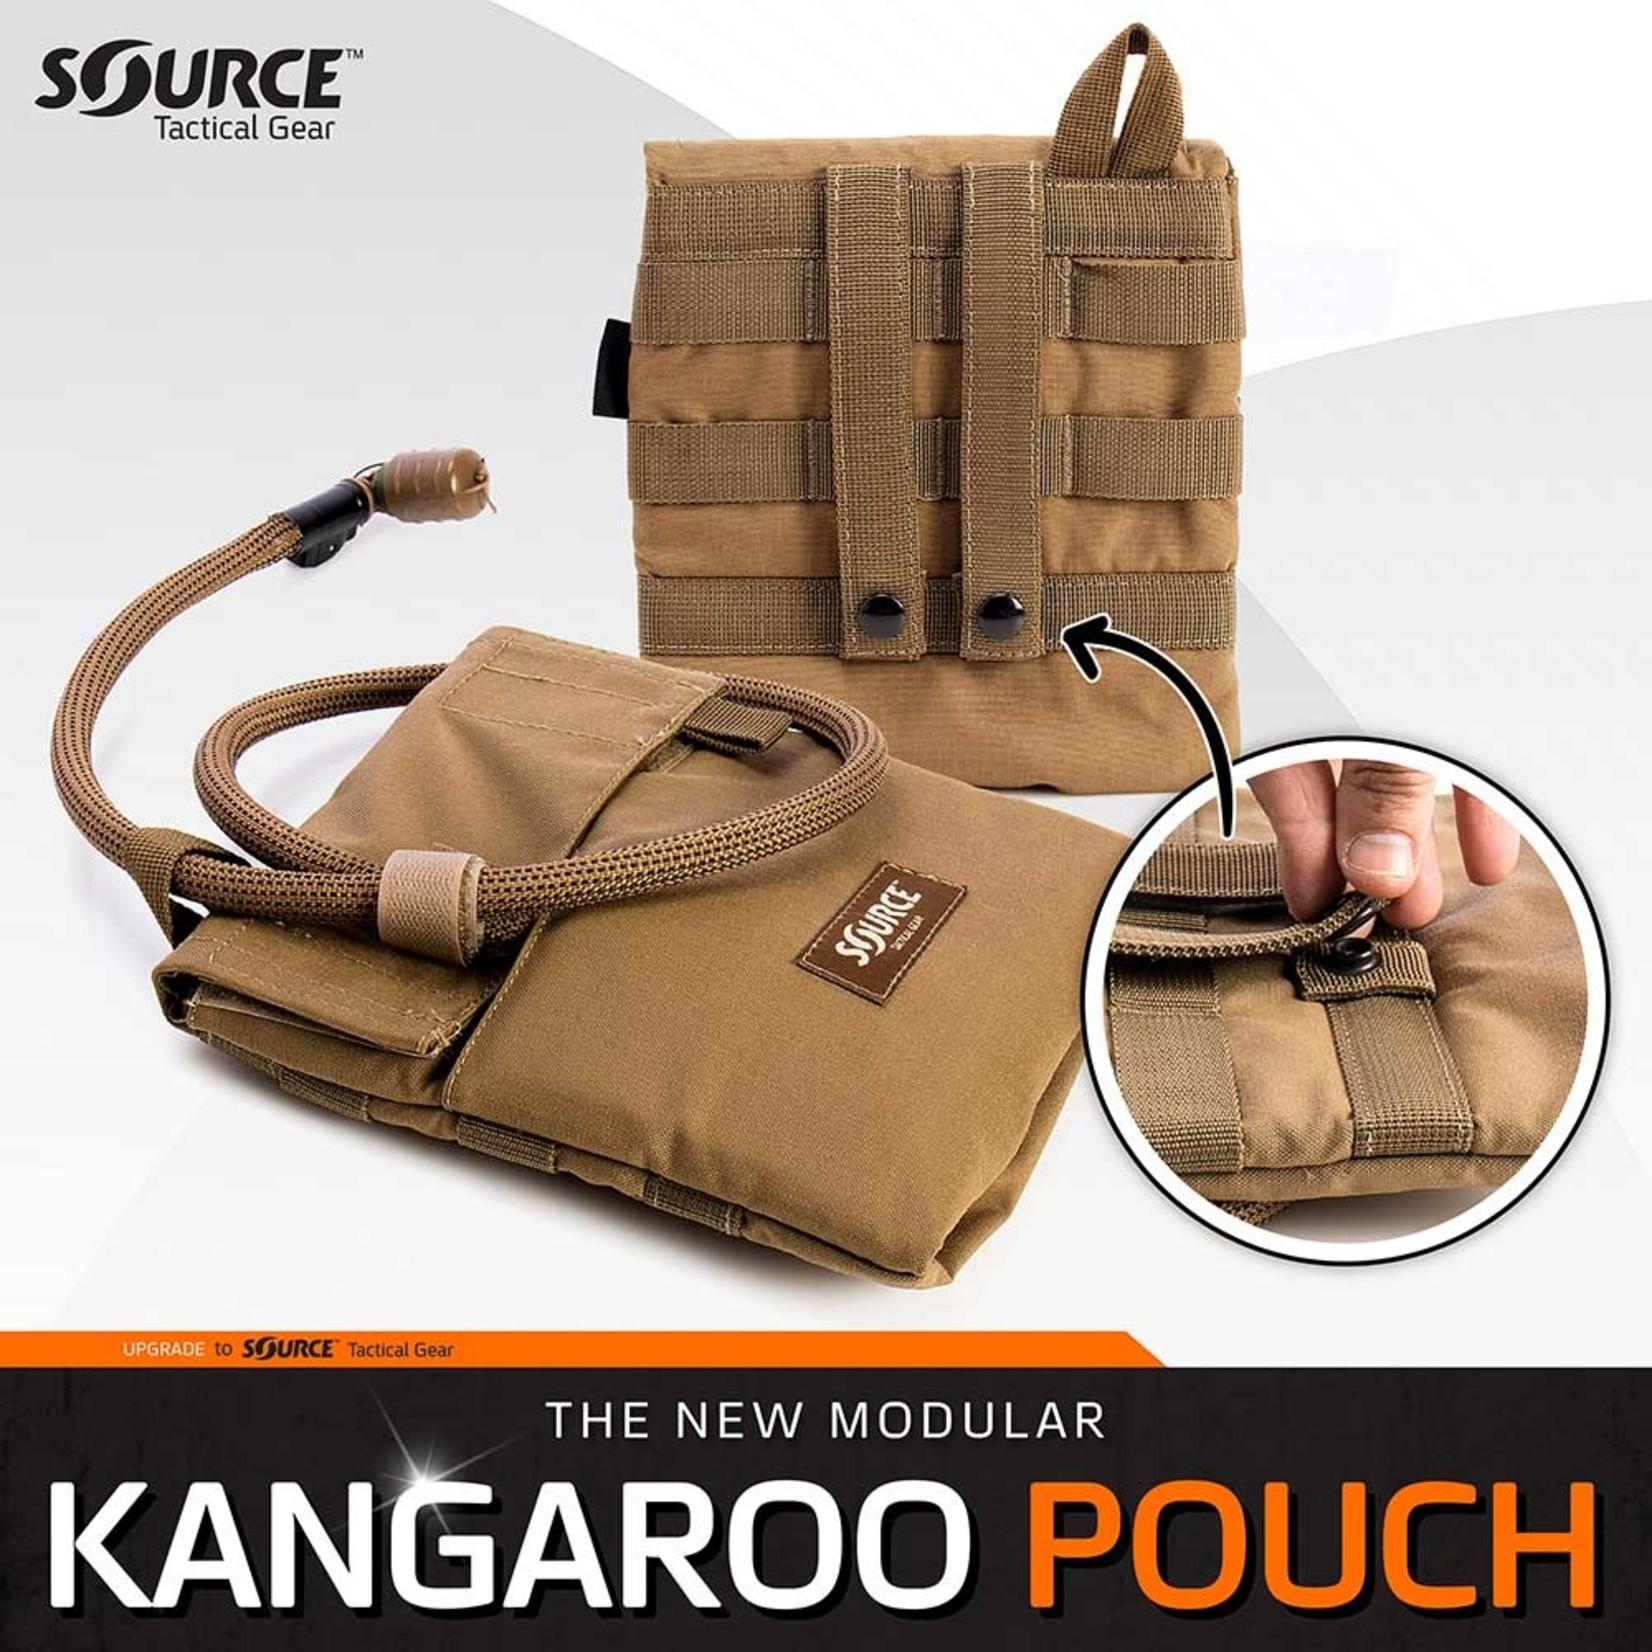 SOURCE TACTICAL GEAR KANGAROO 1L POUCH KIT